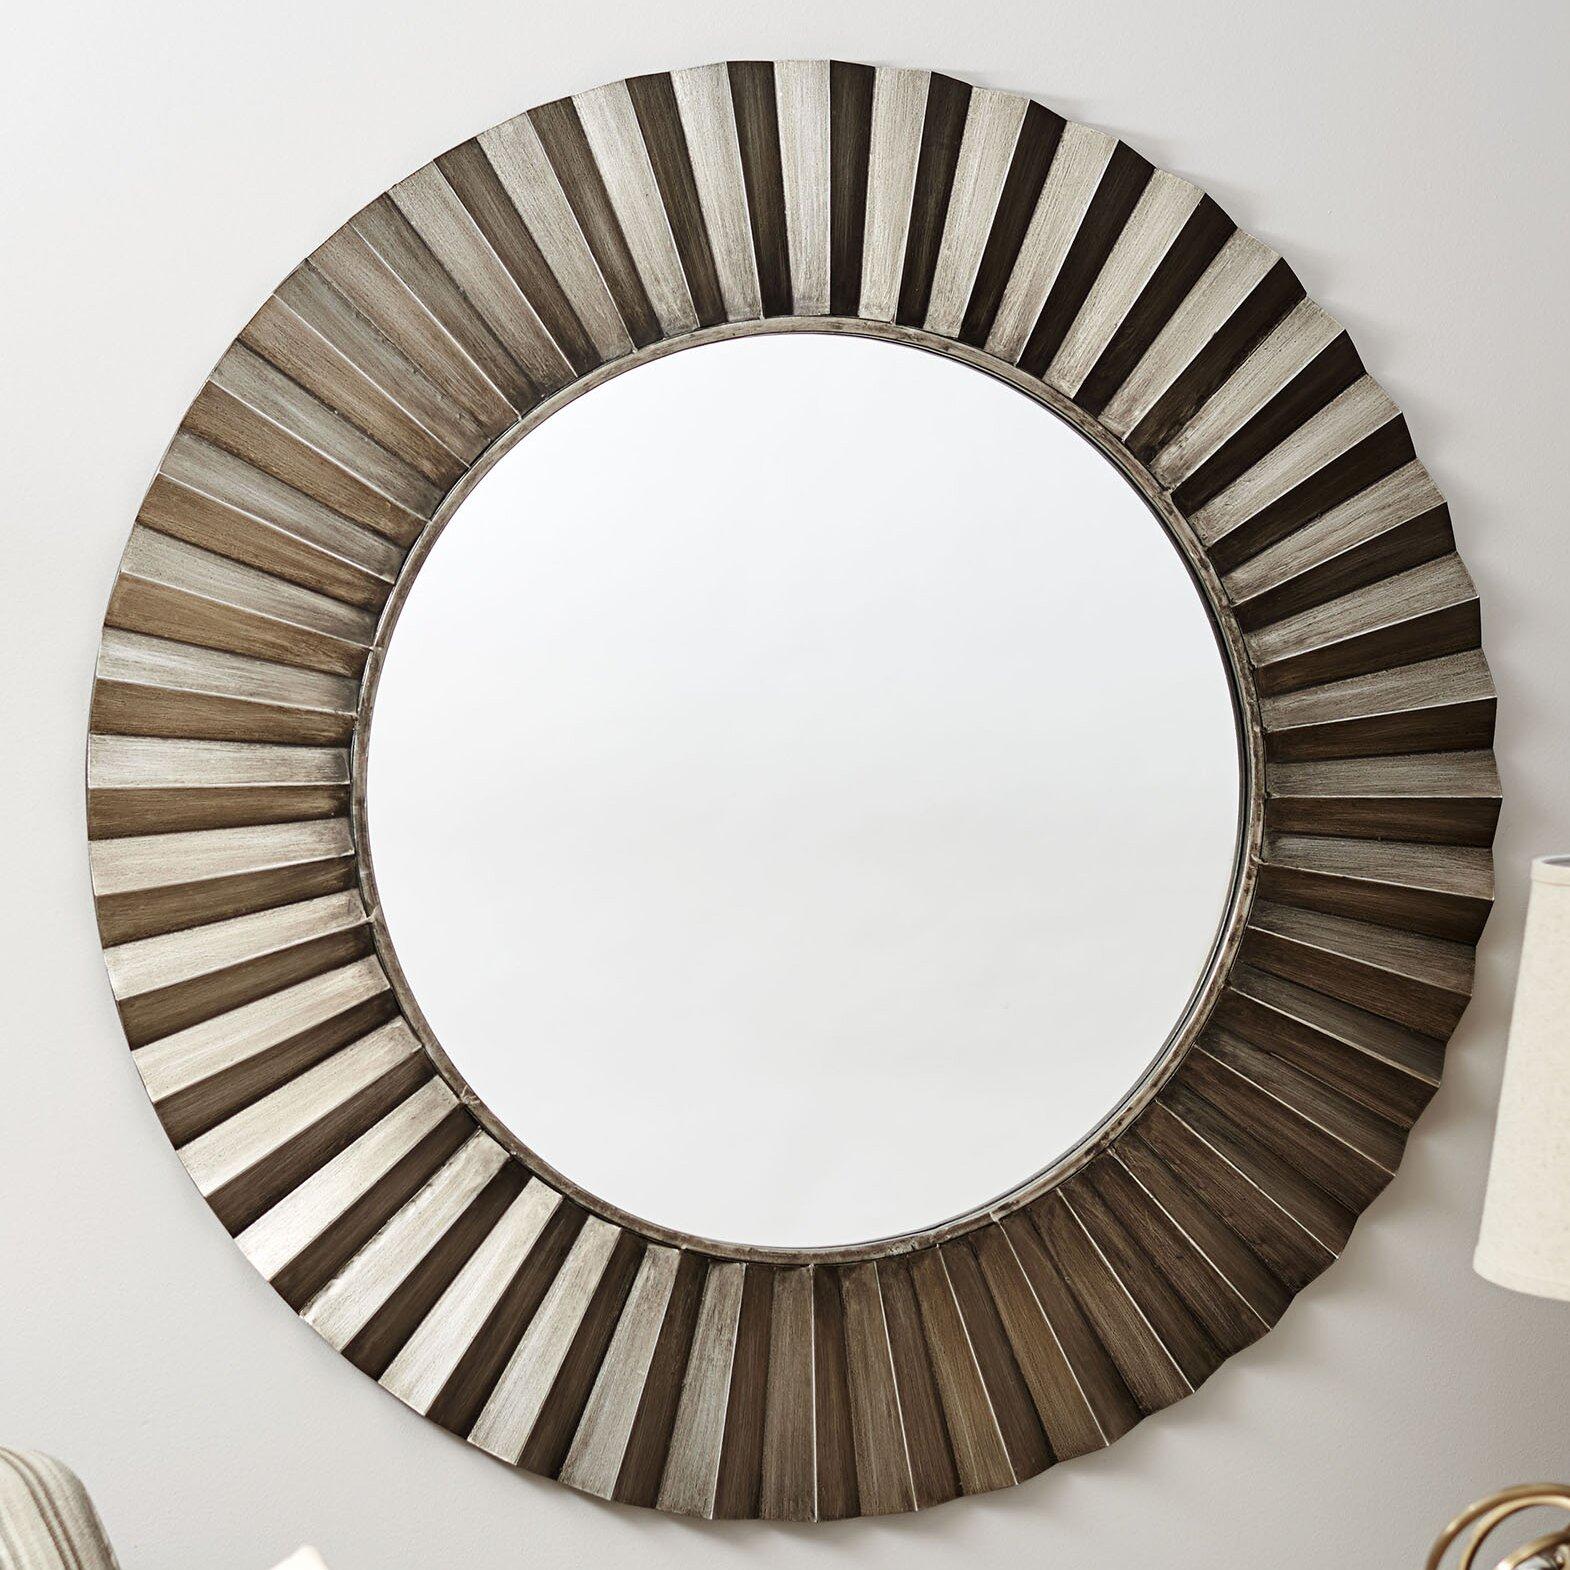 Household Essentials Sunburst Wall Mirror & Reviews | Wayfair